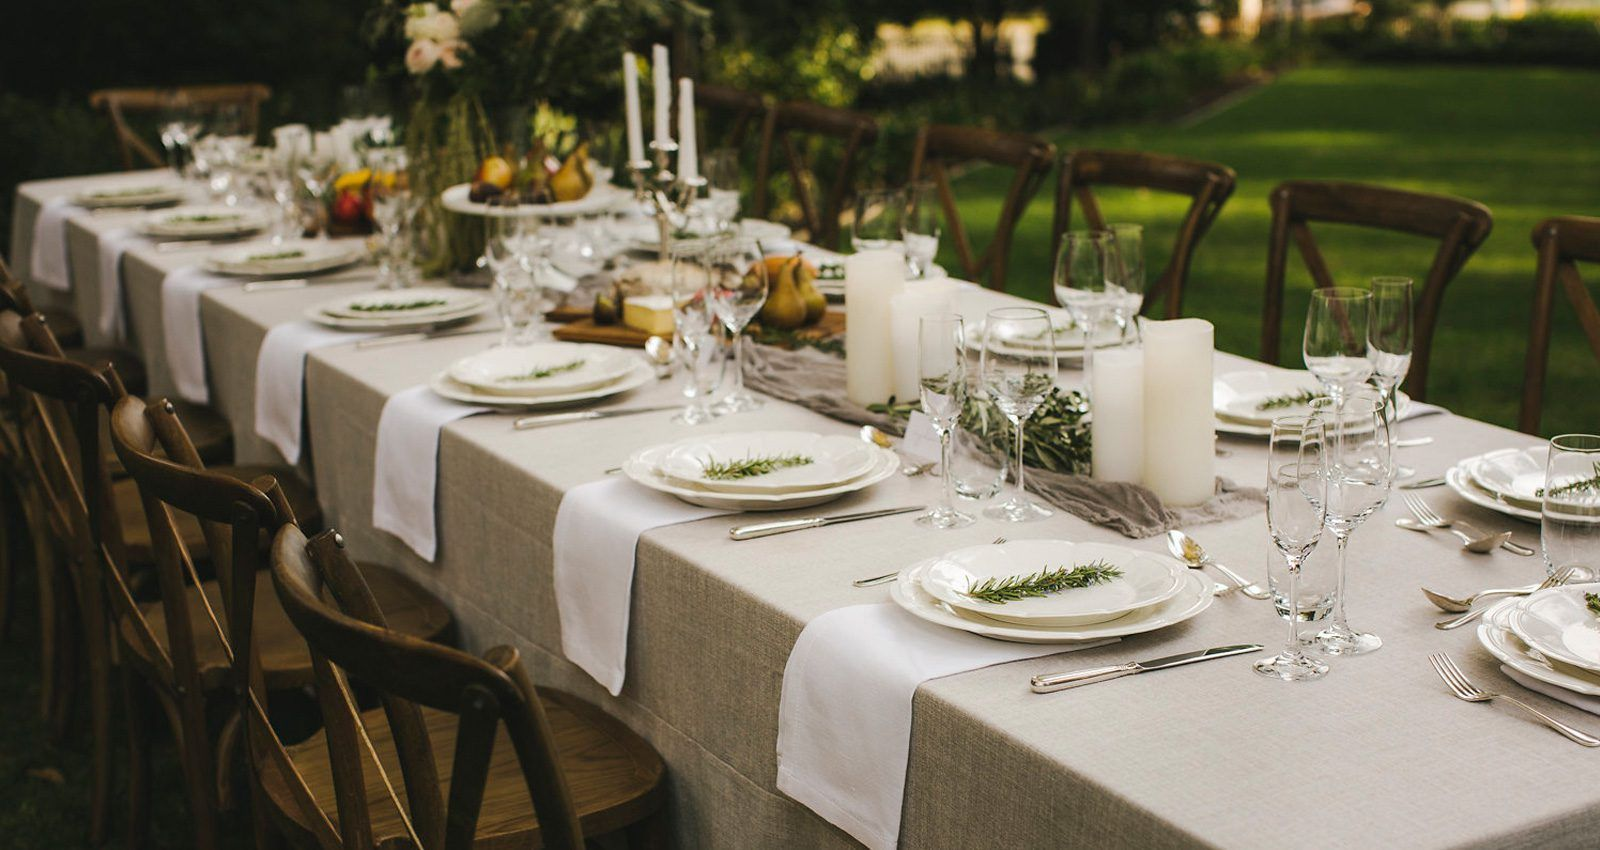 Wedding Decorations Ideas Pinterest Shabby Chic Wedding Decor Wedding Chair Hire Wedding Chairs